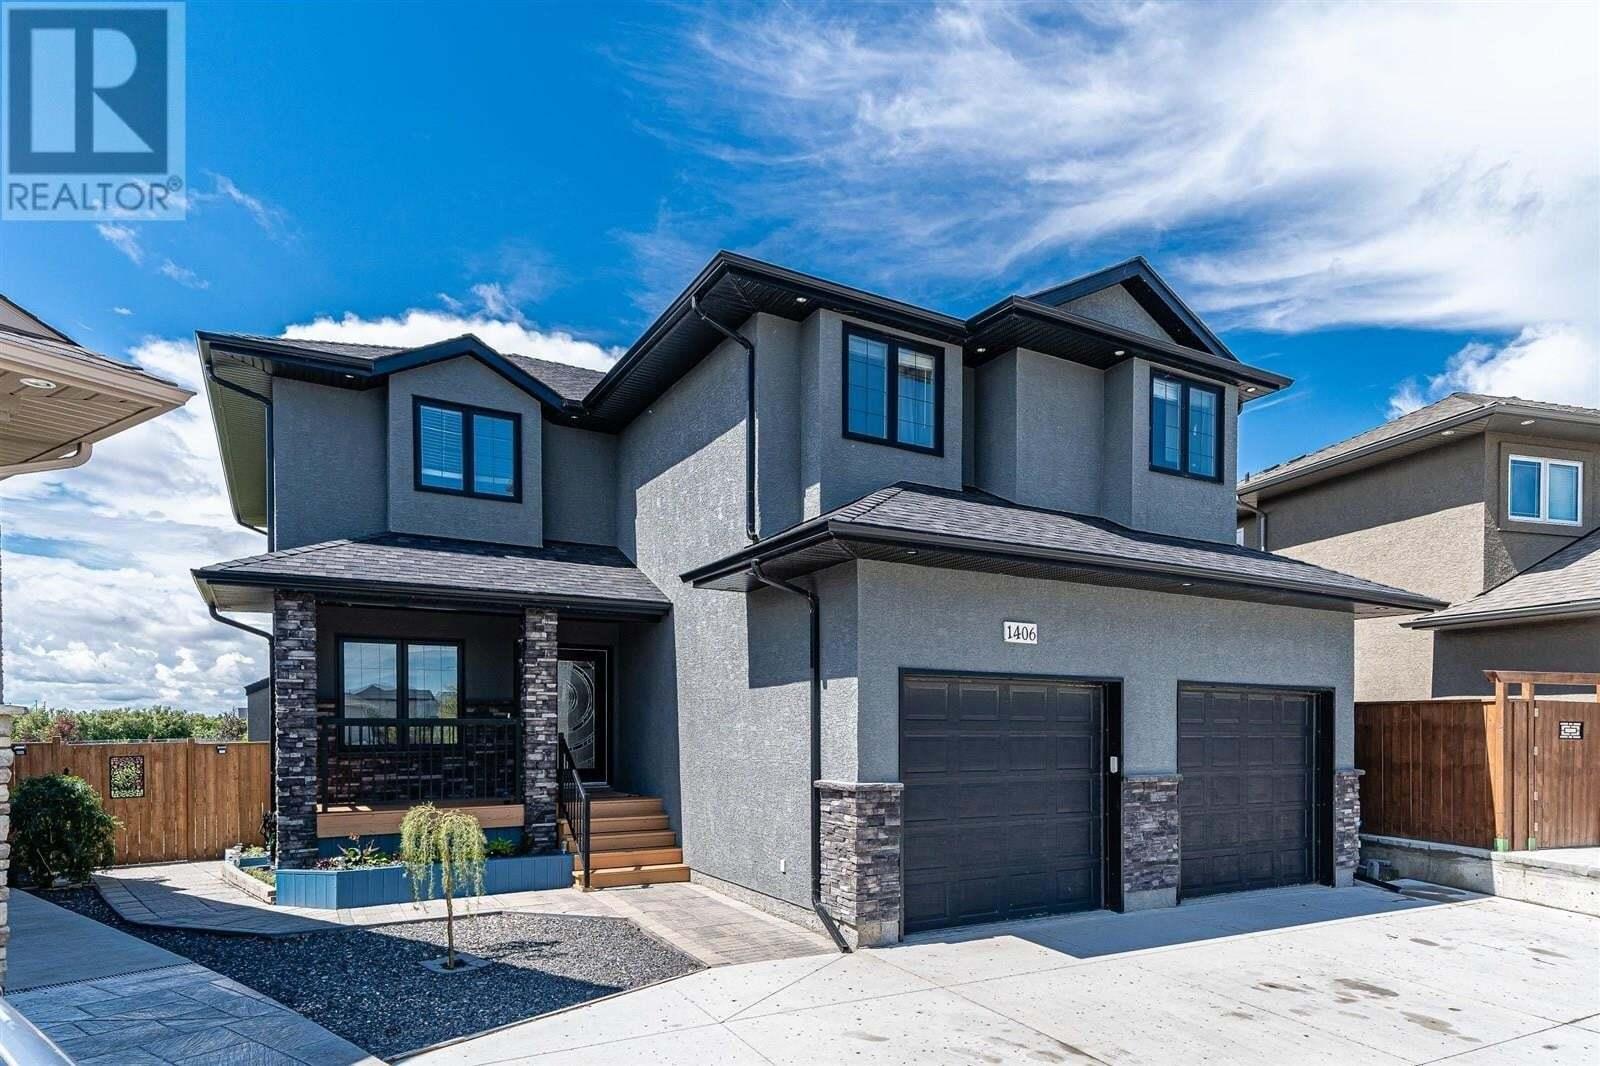 House for sale at 1406 Pohorecky Pl Saskatoon Saskatchewan - MLS: SK818021